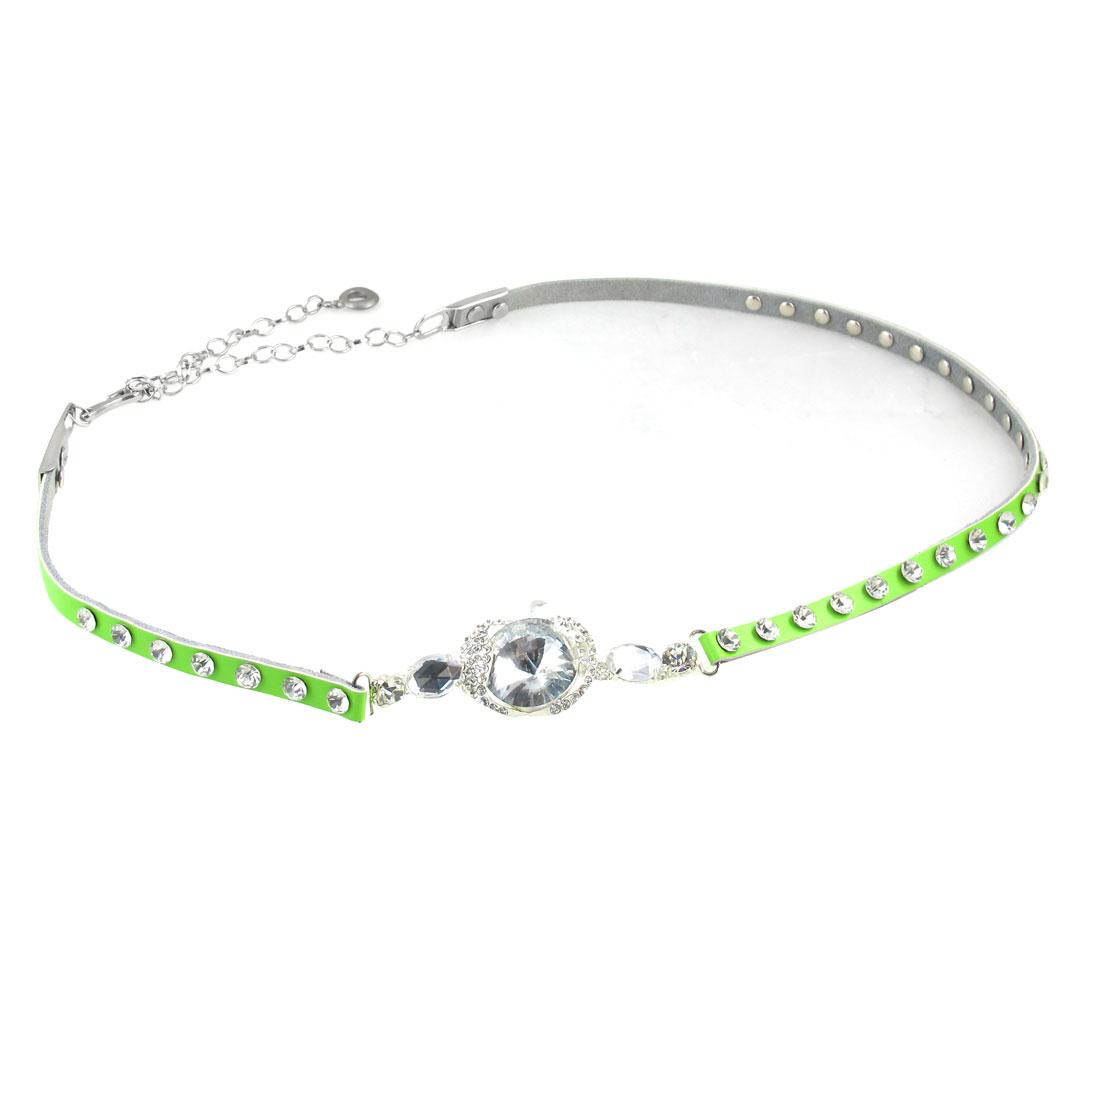 Faux Crystal Inlaid Apple Decor Hook Closure Light Green Waist Belt for Ladies